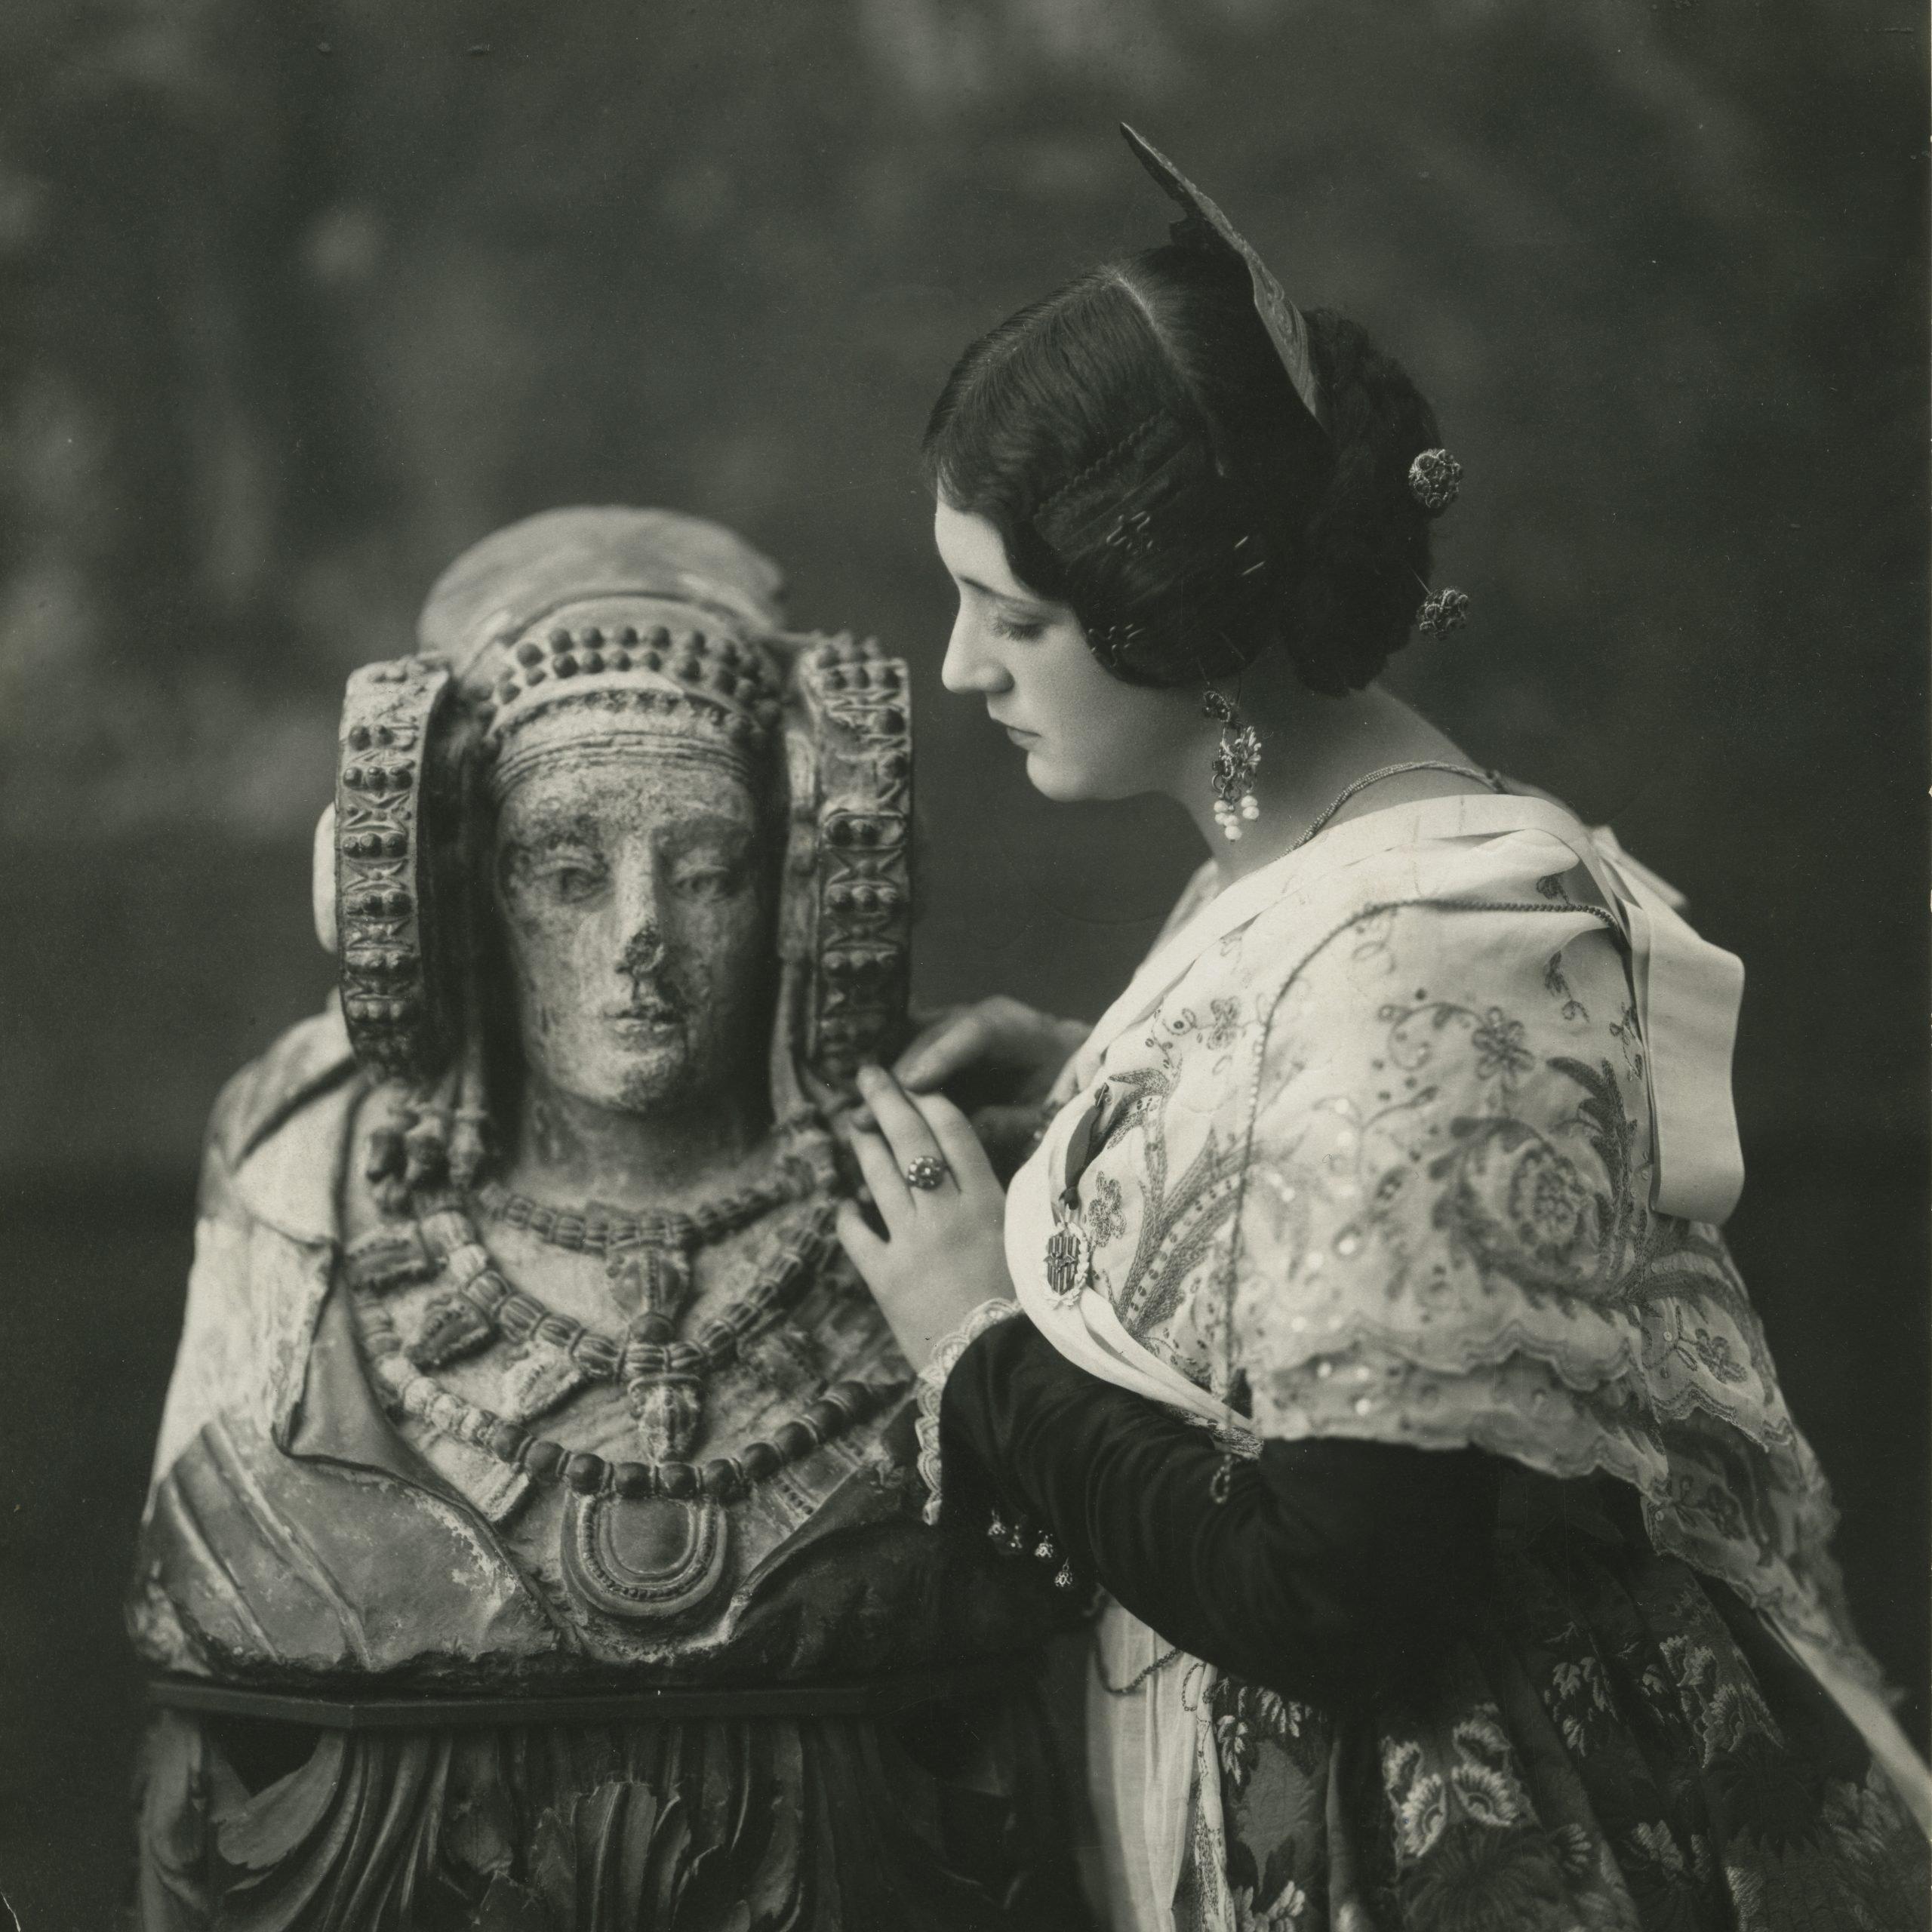 Pepita Samper posa junto a la Dama de Elche.